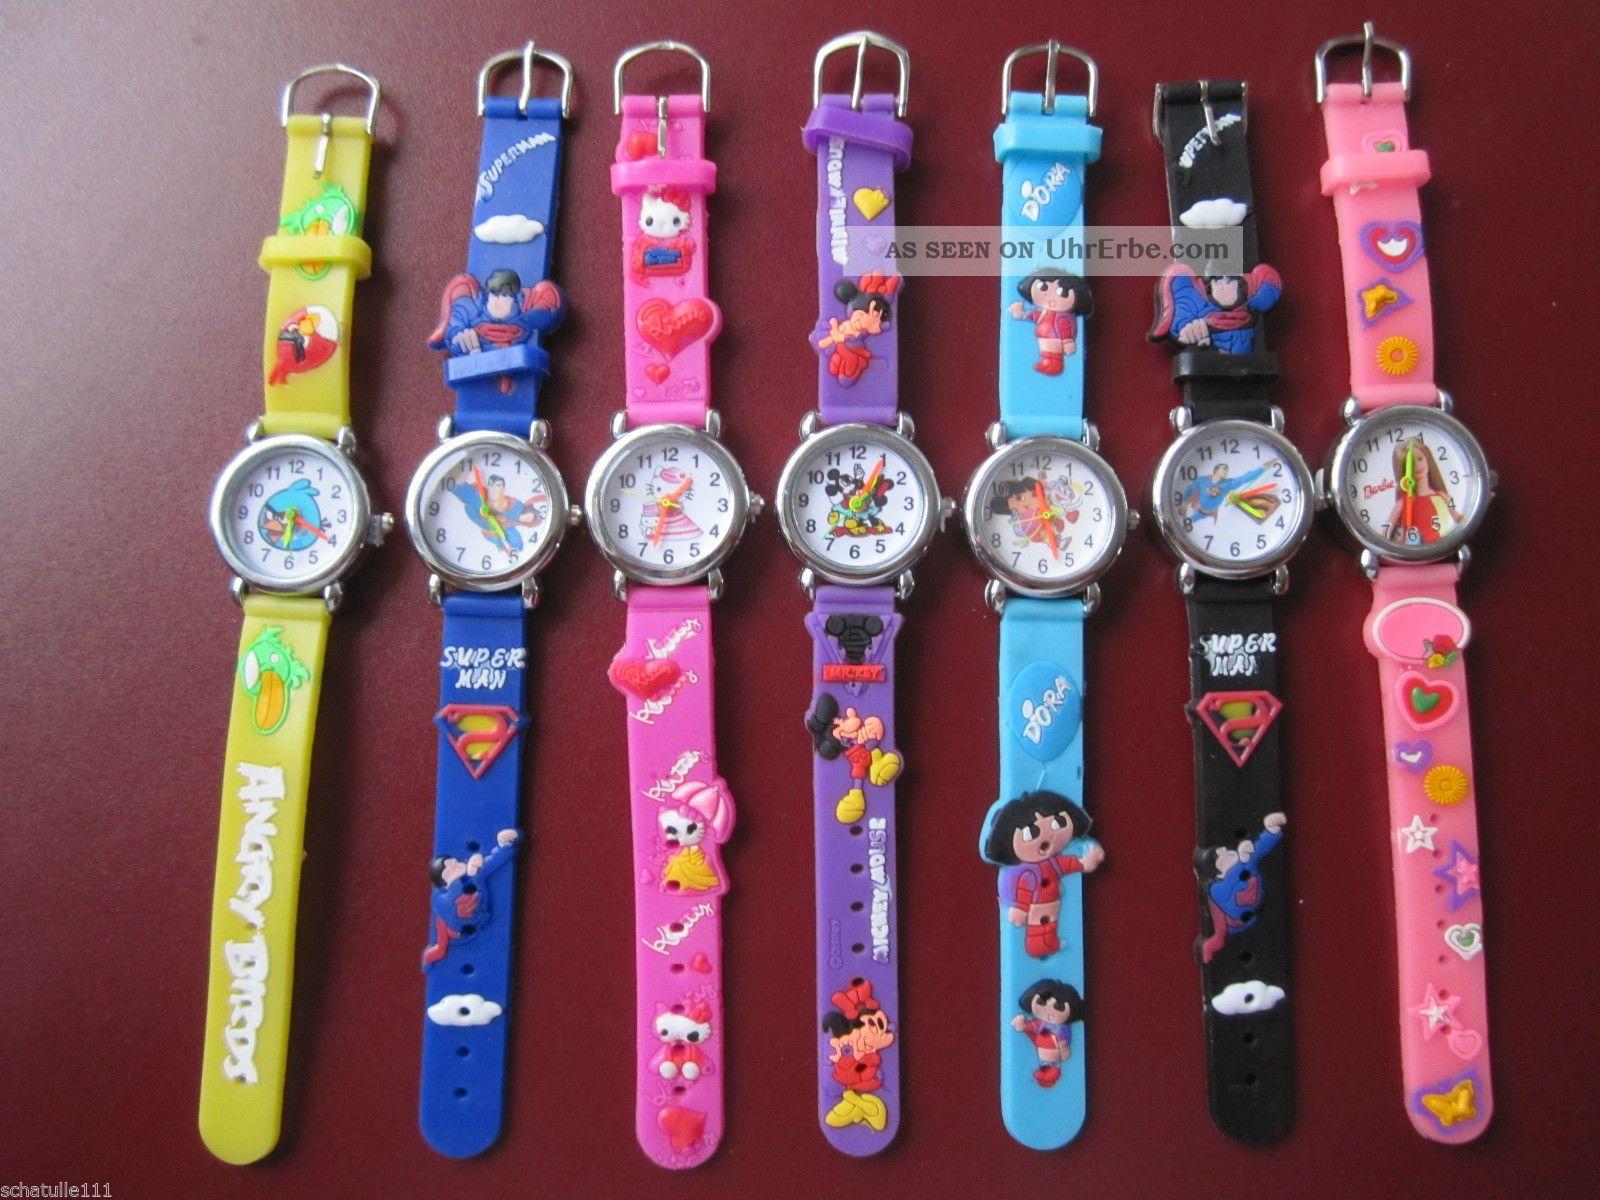 3d Kinder Uhr Silikon Mit Versch.  Motiven U.  Farbauswahl D85 Armbanduhren Bild